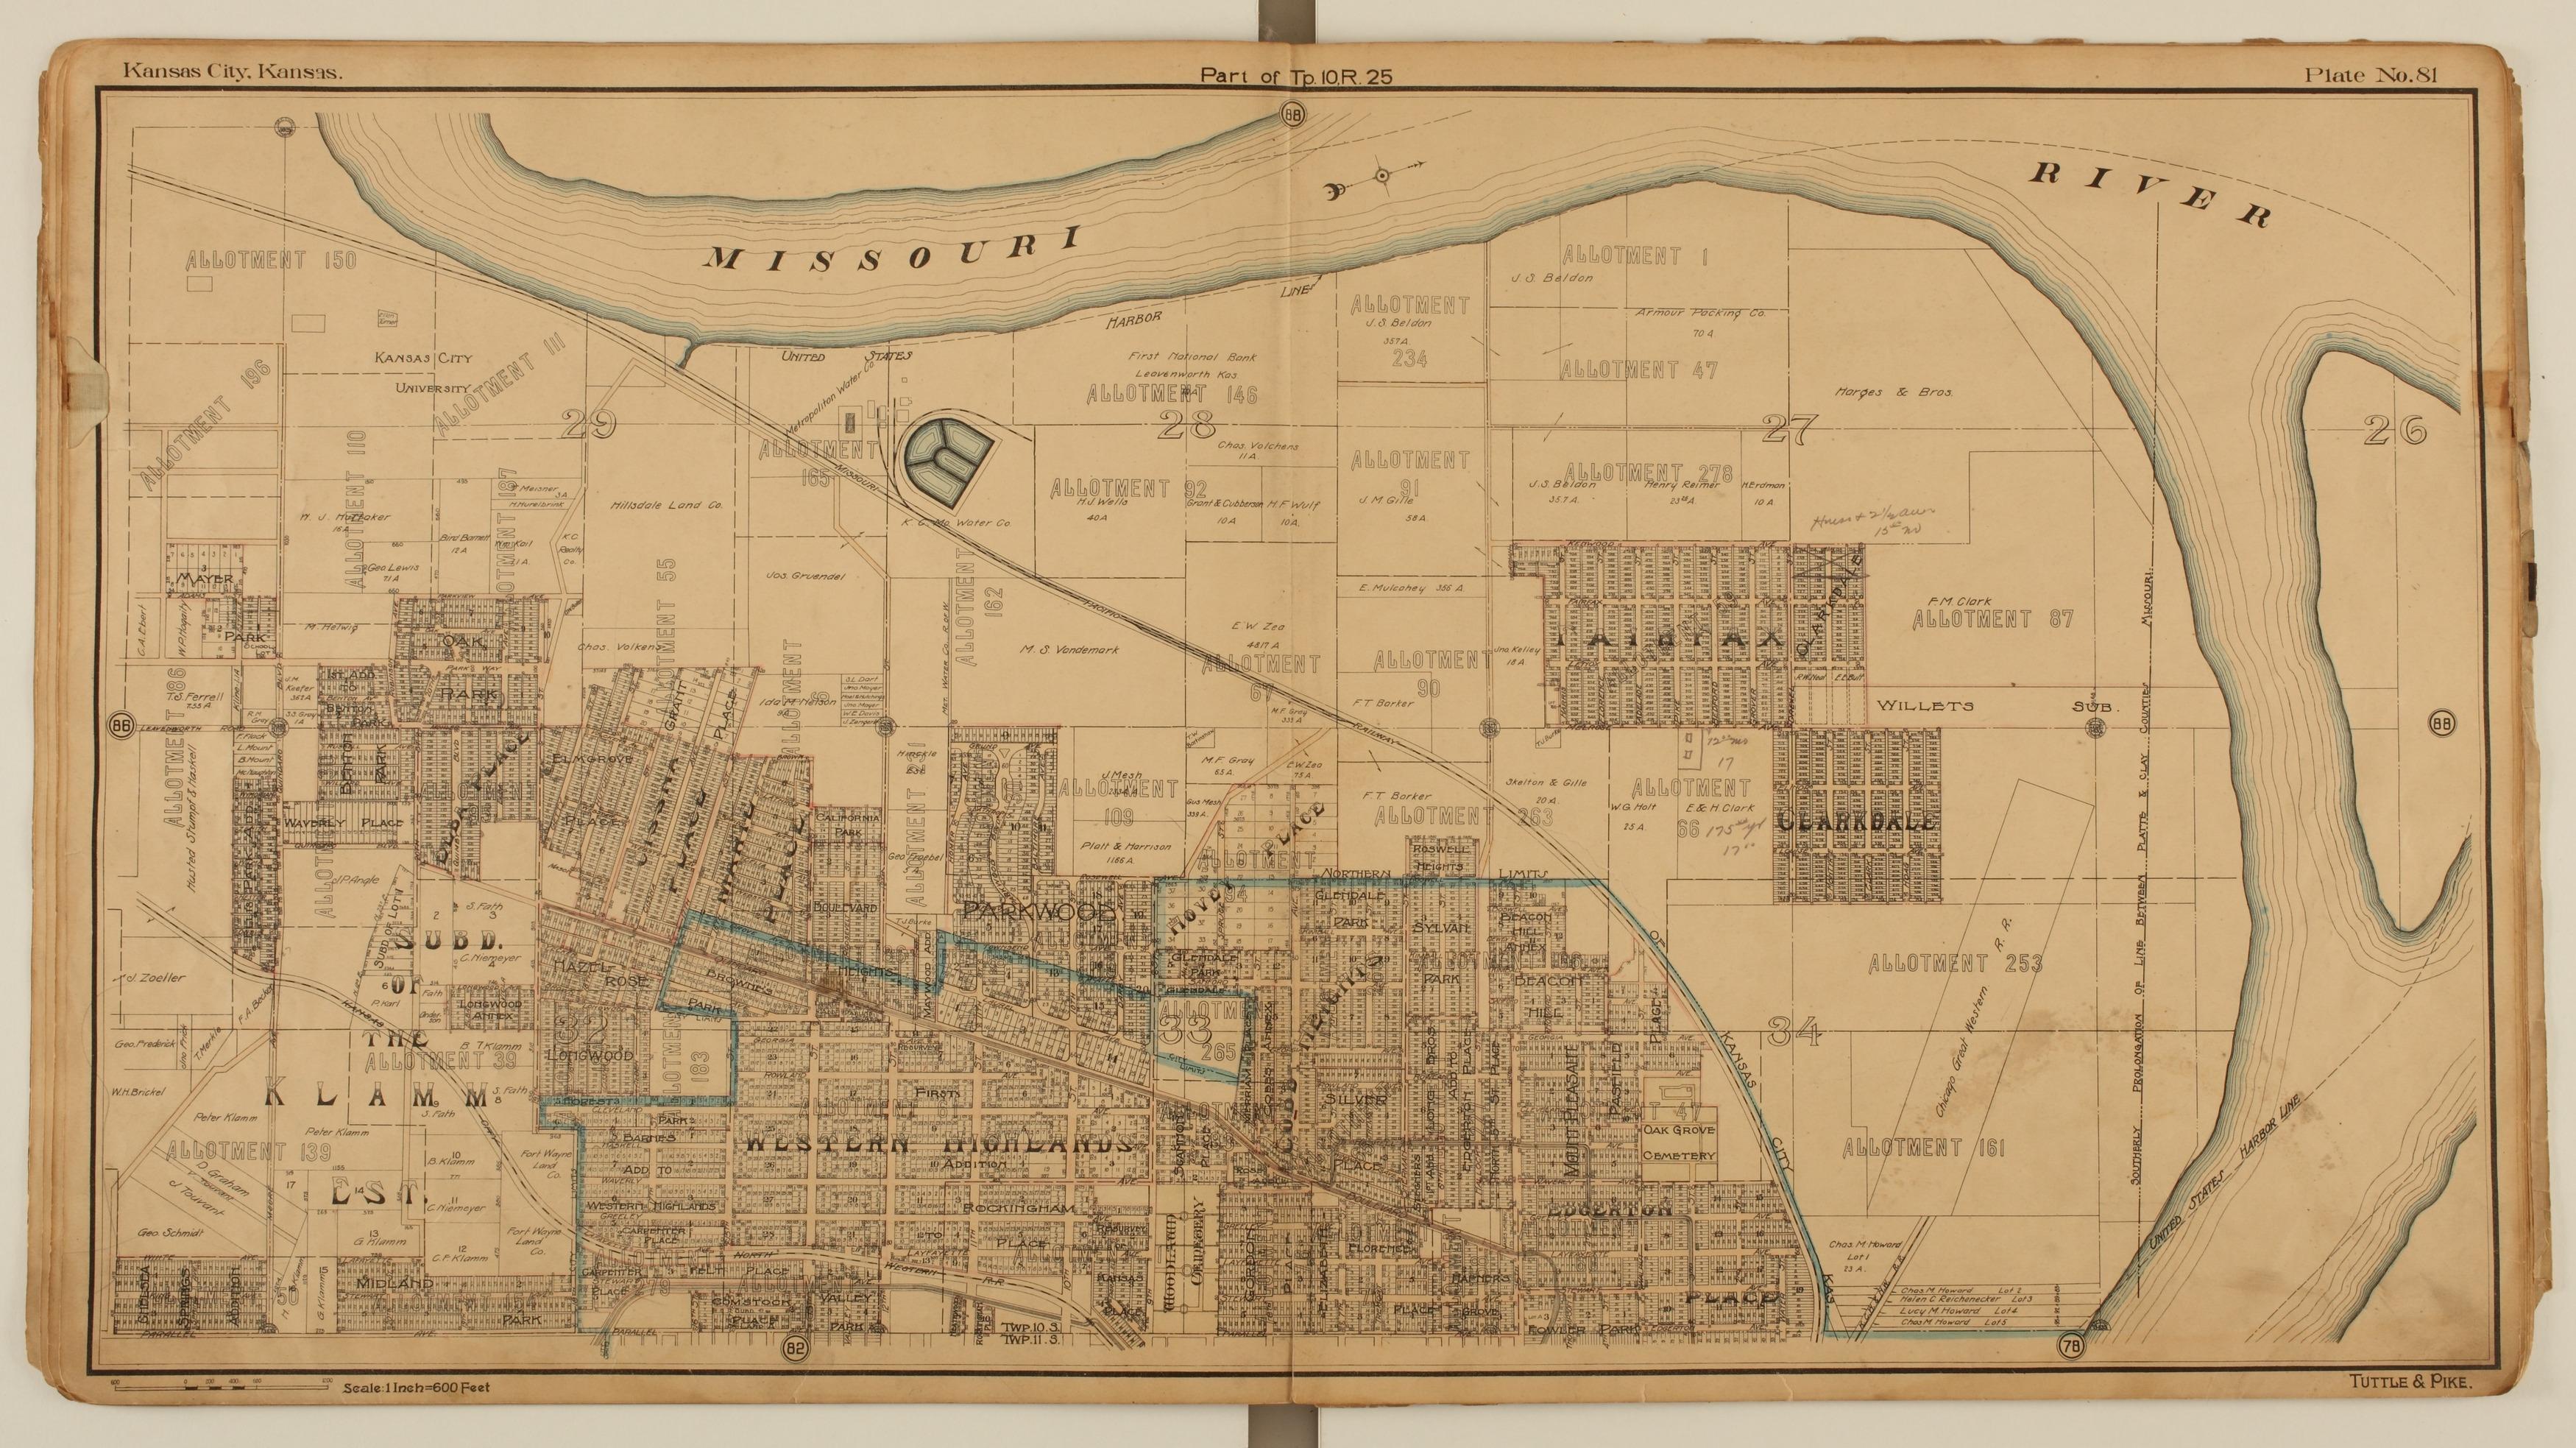 Tuttle and Pike's atlas of Kansas City, Kansas - 7